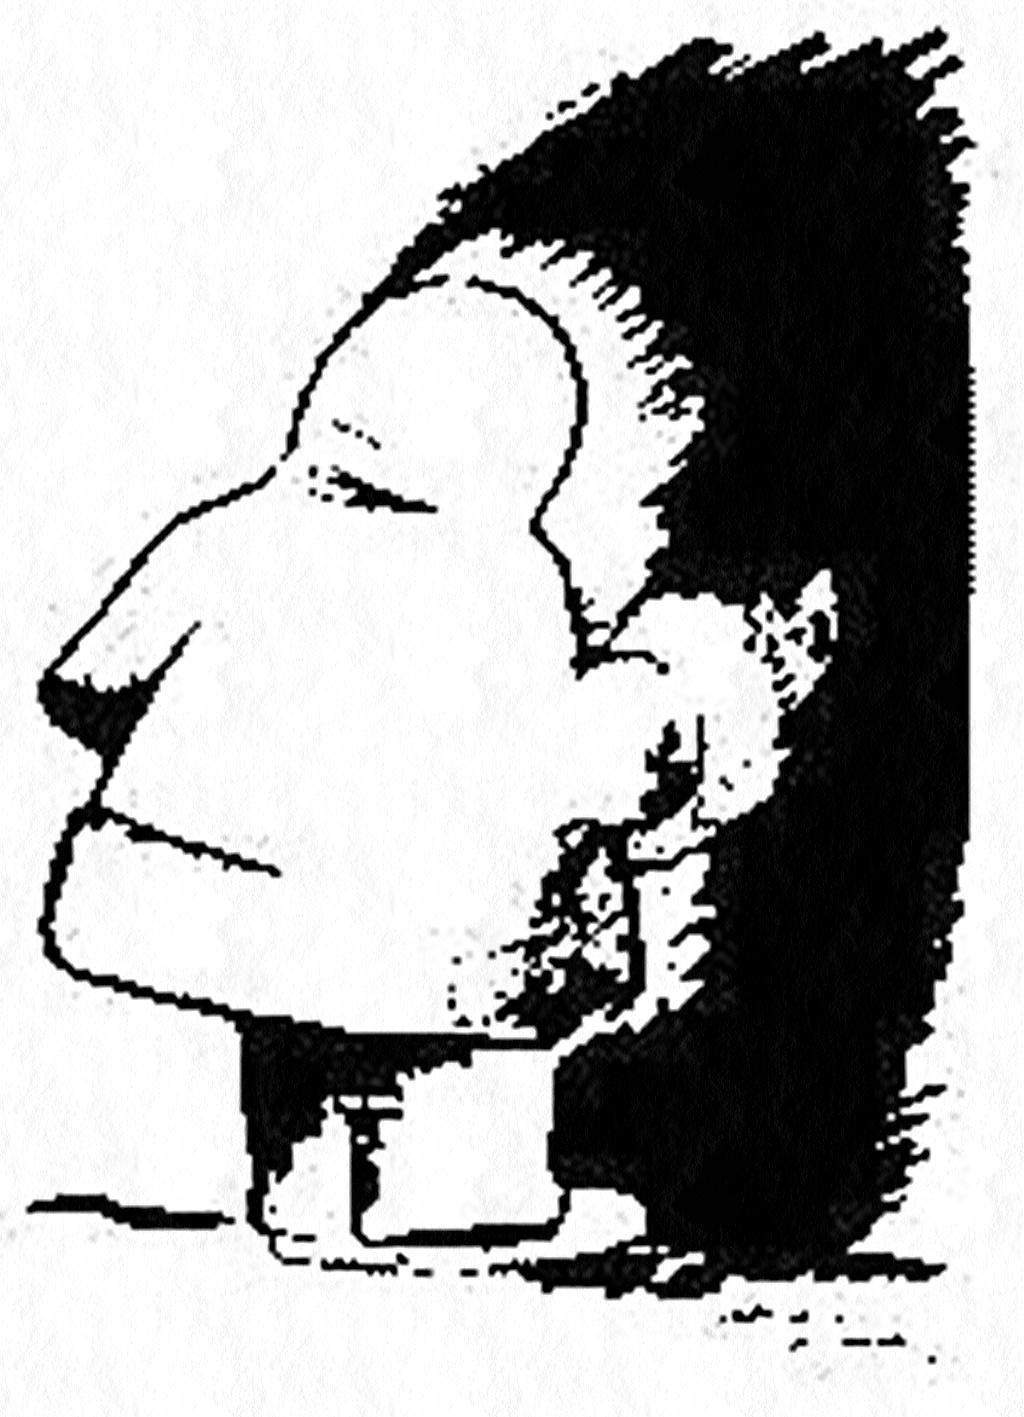 Прикольные картинки обман зрения 3: dreampics.ru/picture.php?id=35856